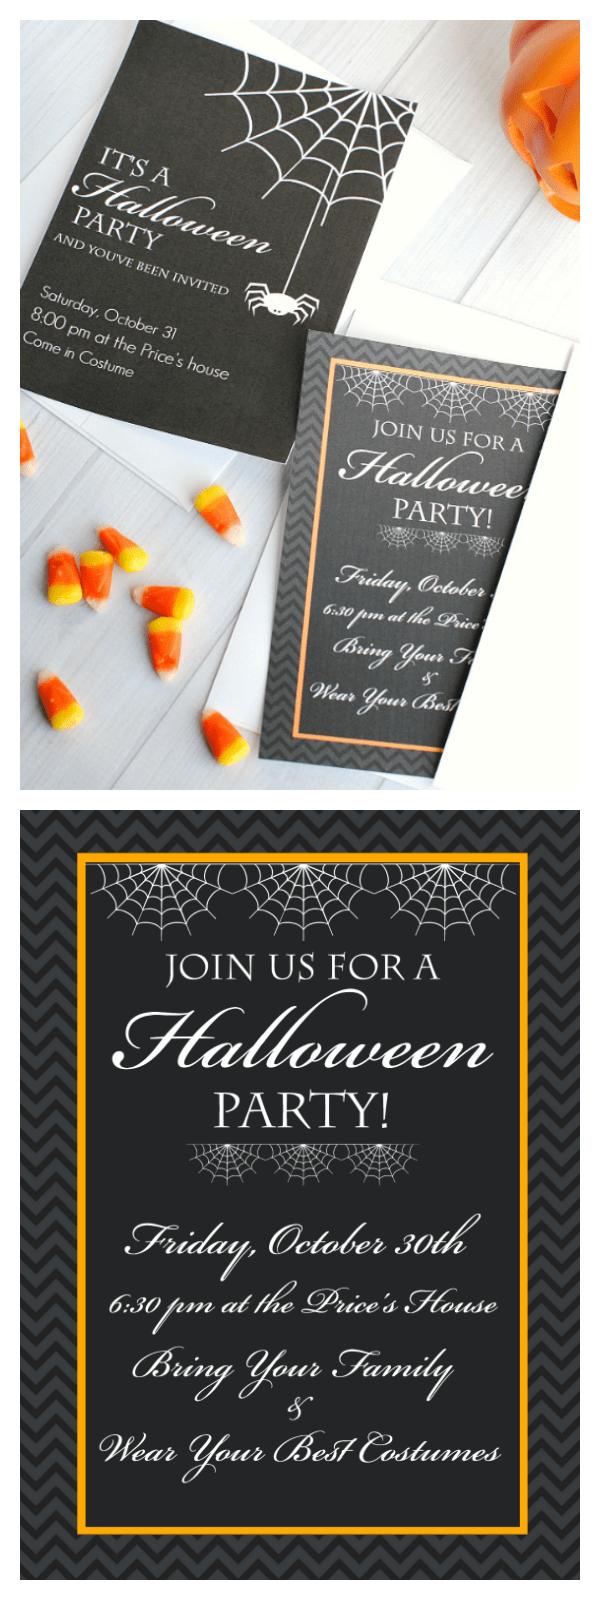 image regarding Printable Halloween Invitations titled Adorable Free of charge Printable Halloween Invites Enjoyment-Squared